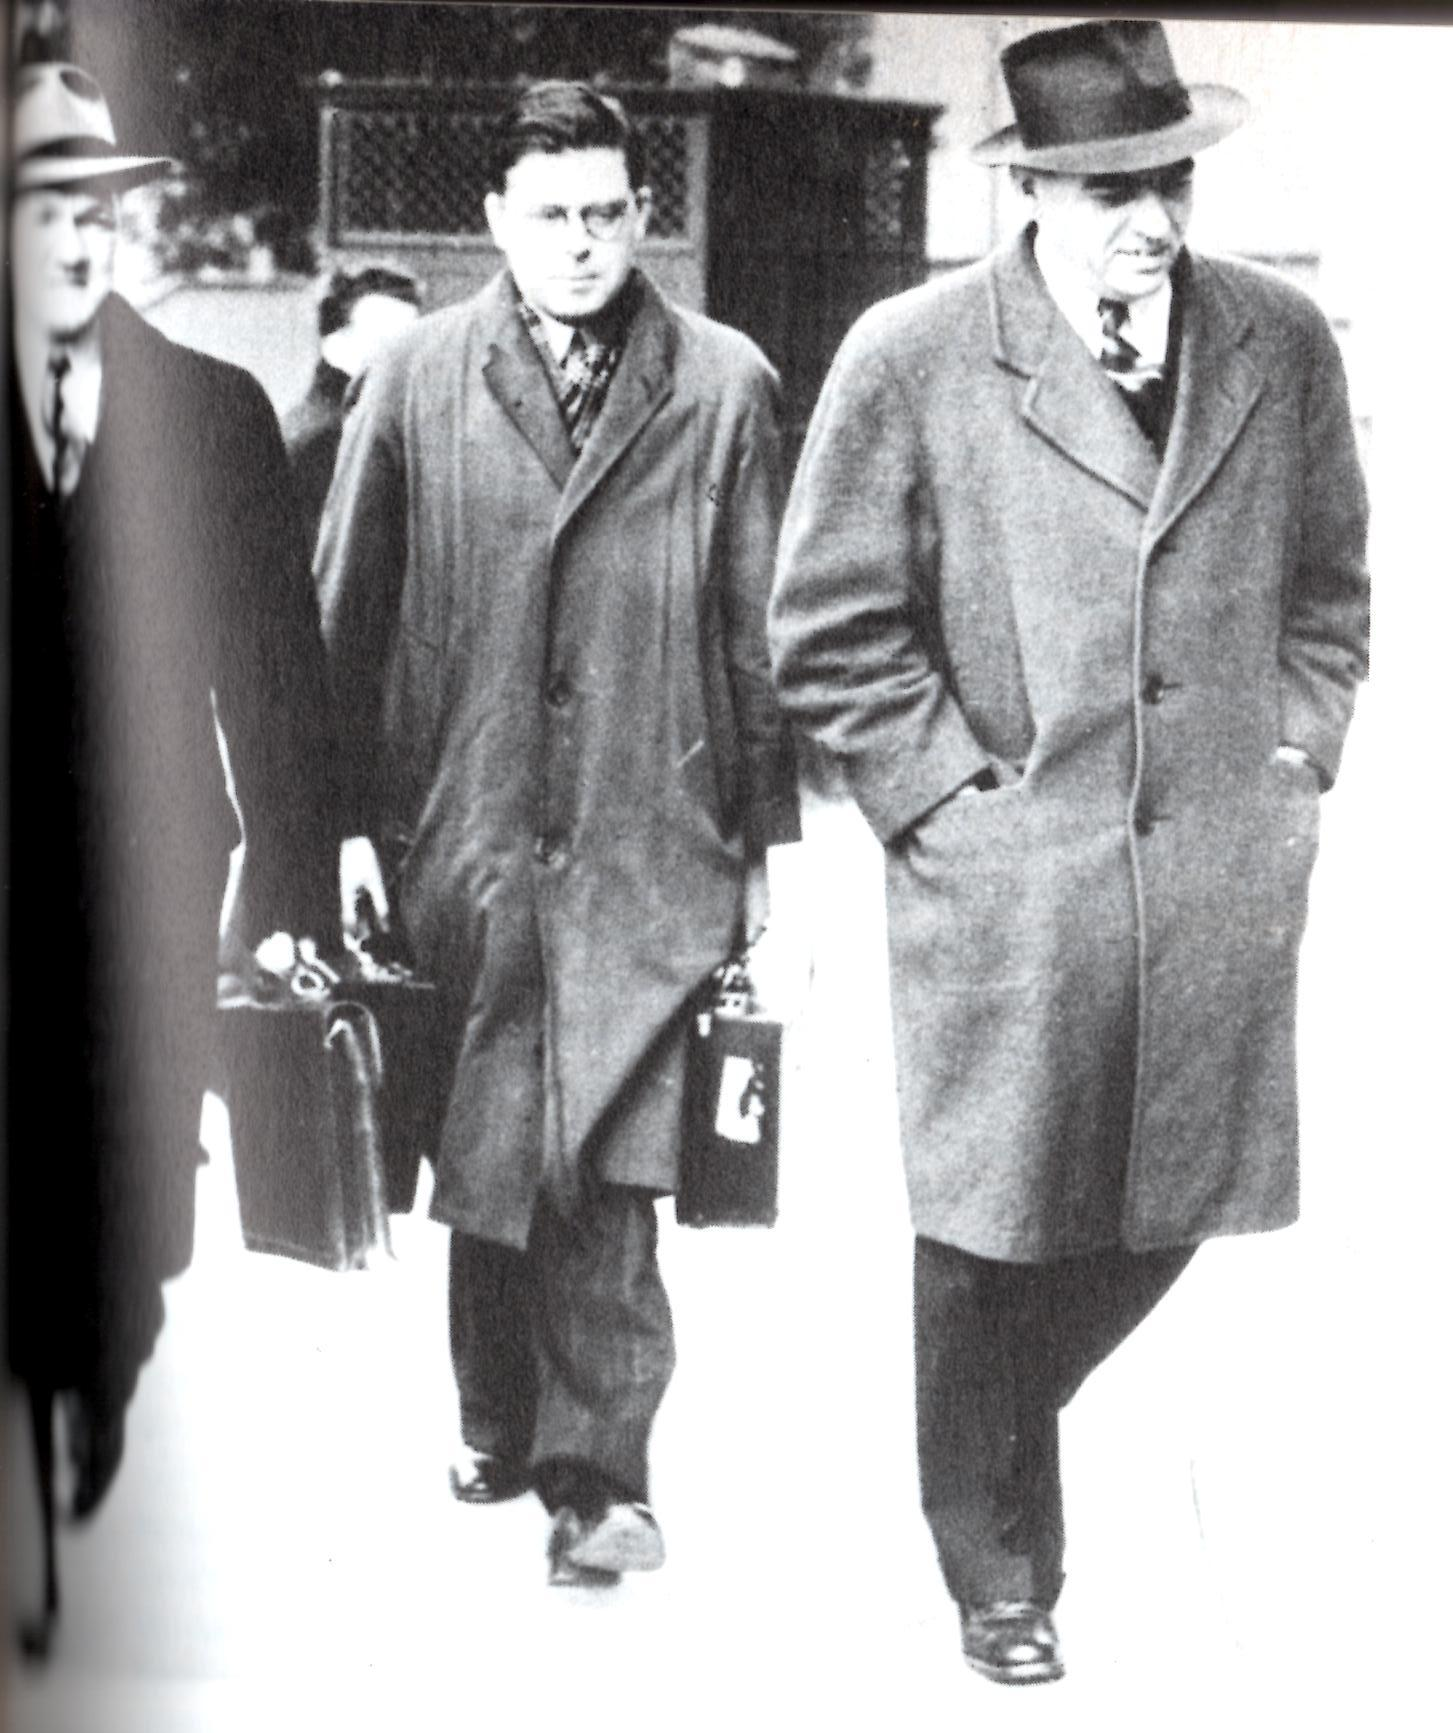 Ted Hill, Jack McPhillips, Ernie Thornton